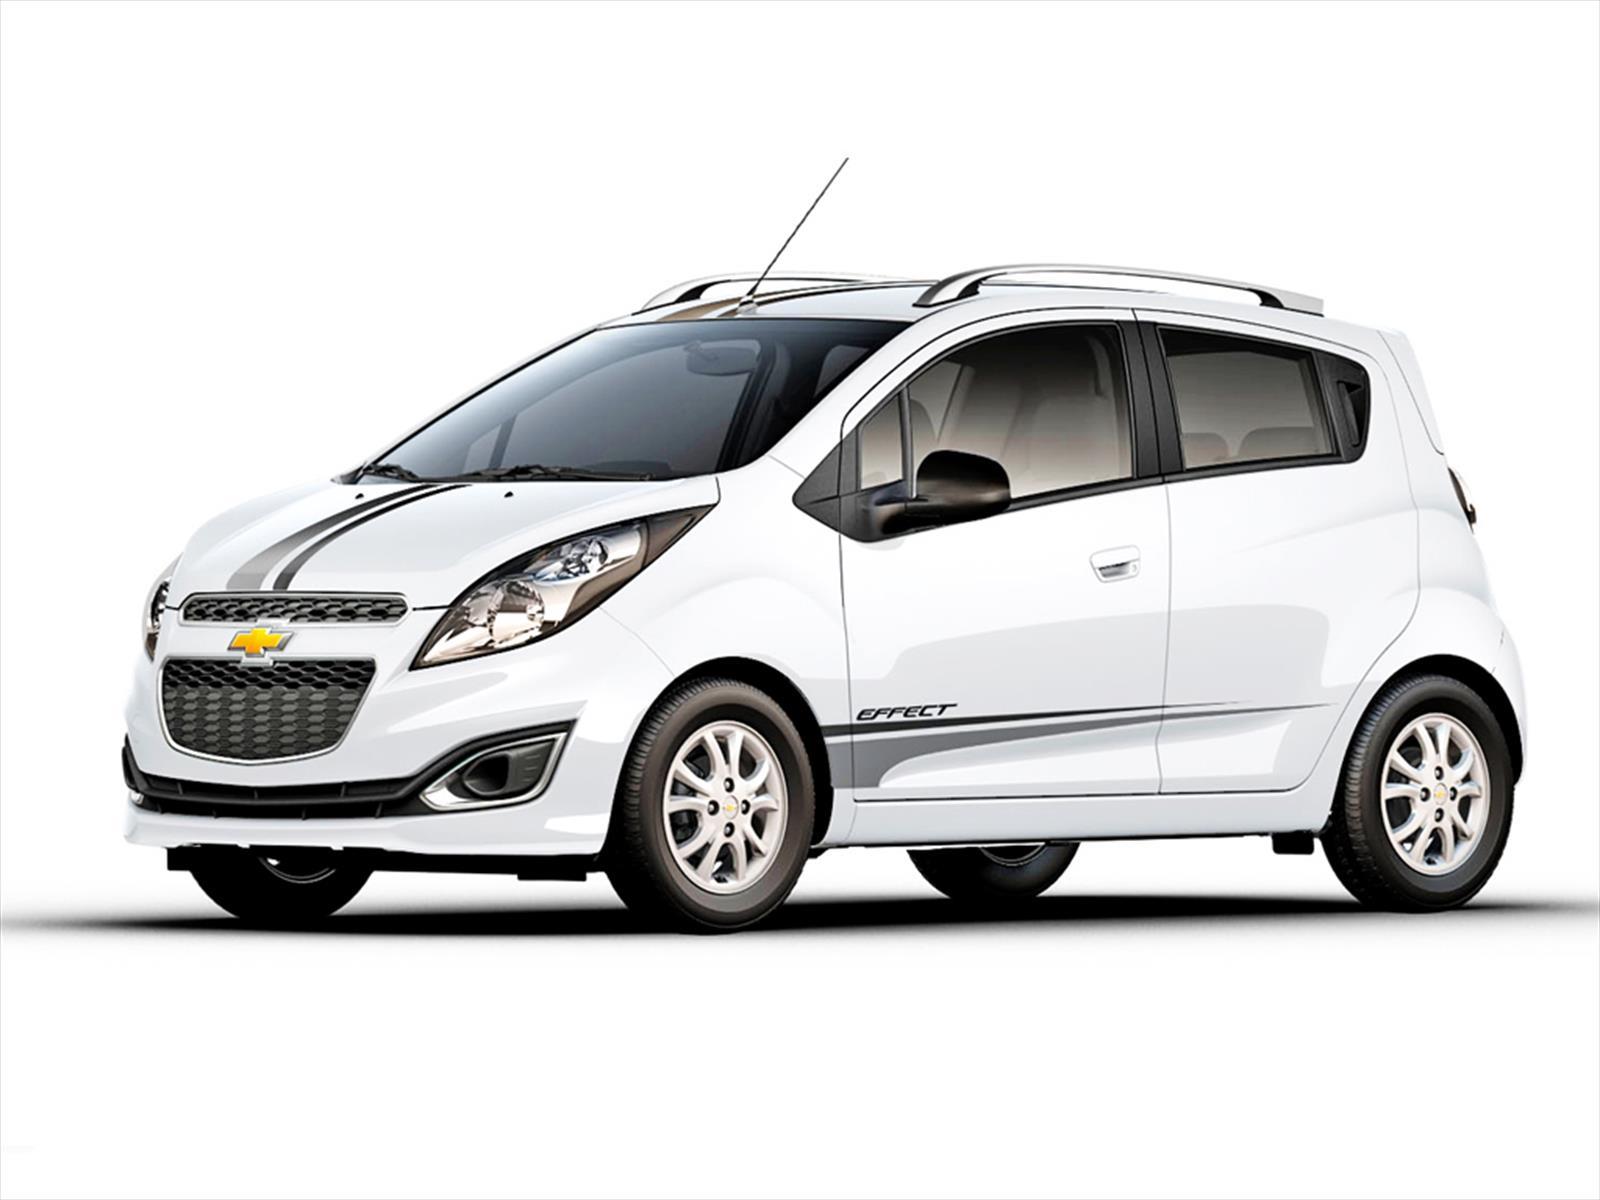 Chevrolet Spark 2017 Caracteristicas | Upcoming Chevrolet